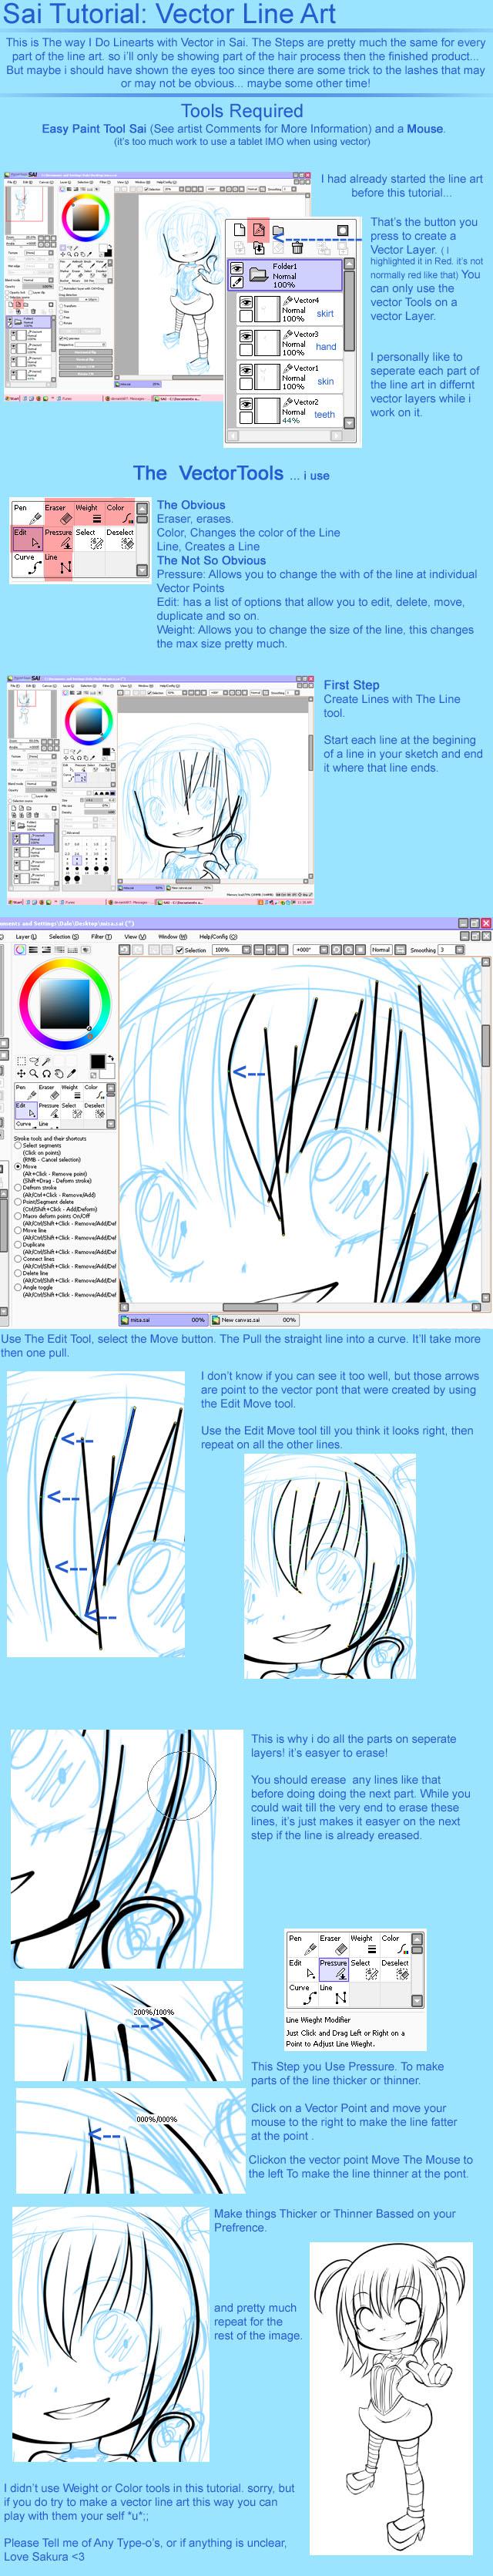 Line Art Sai : Sai tutorial vector line art by sakurachan on deviantart